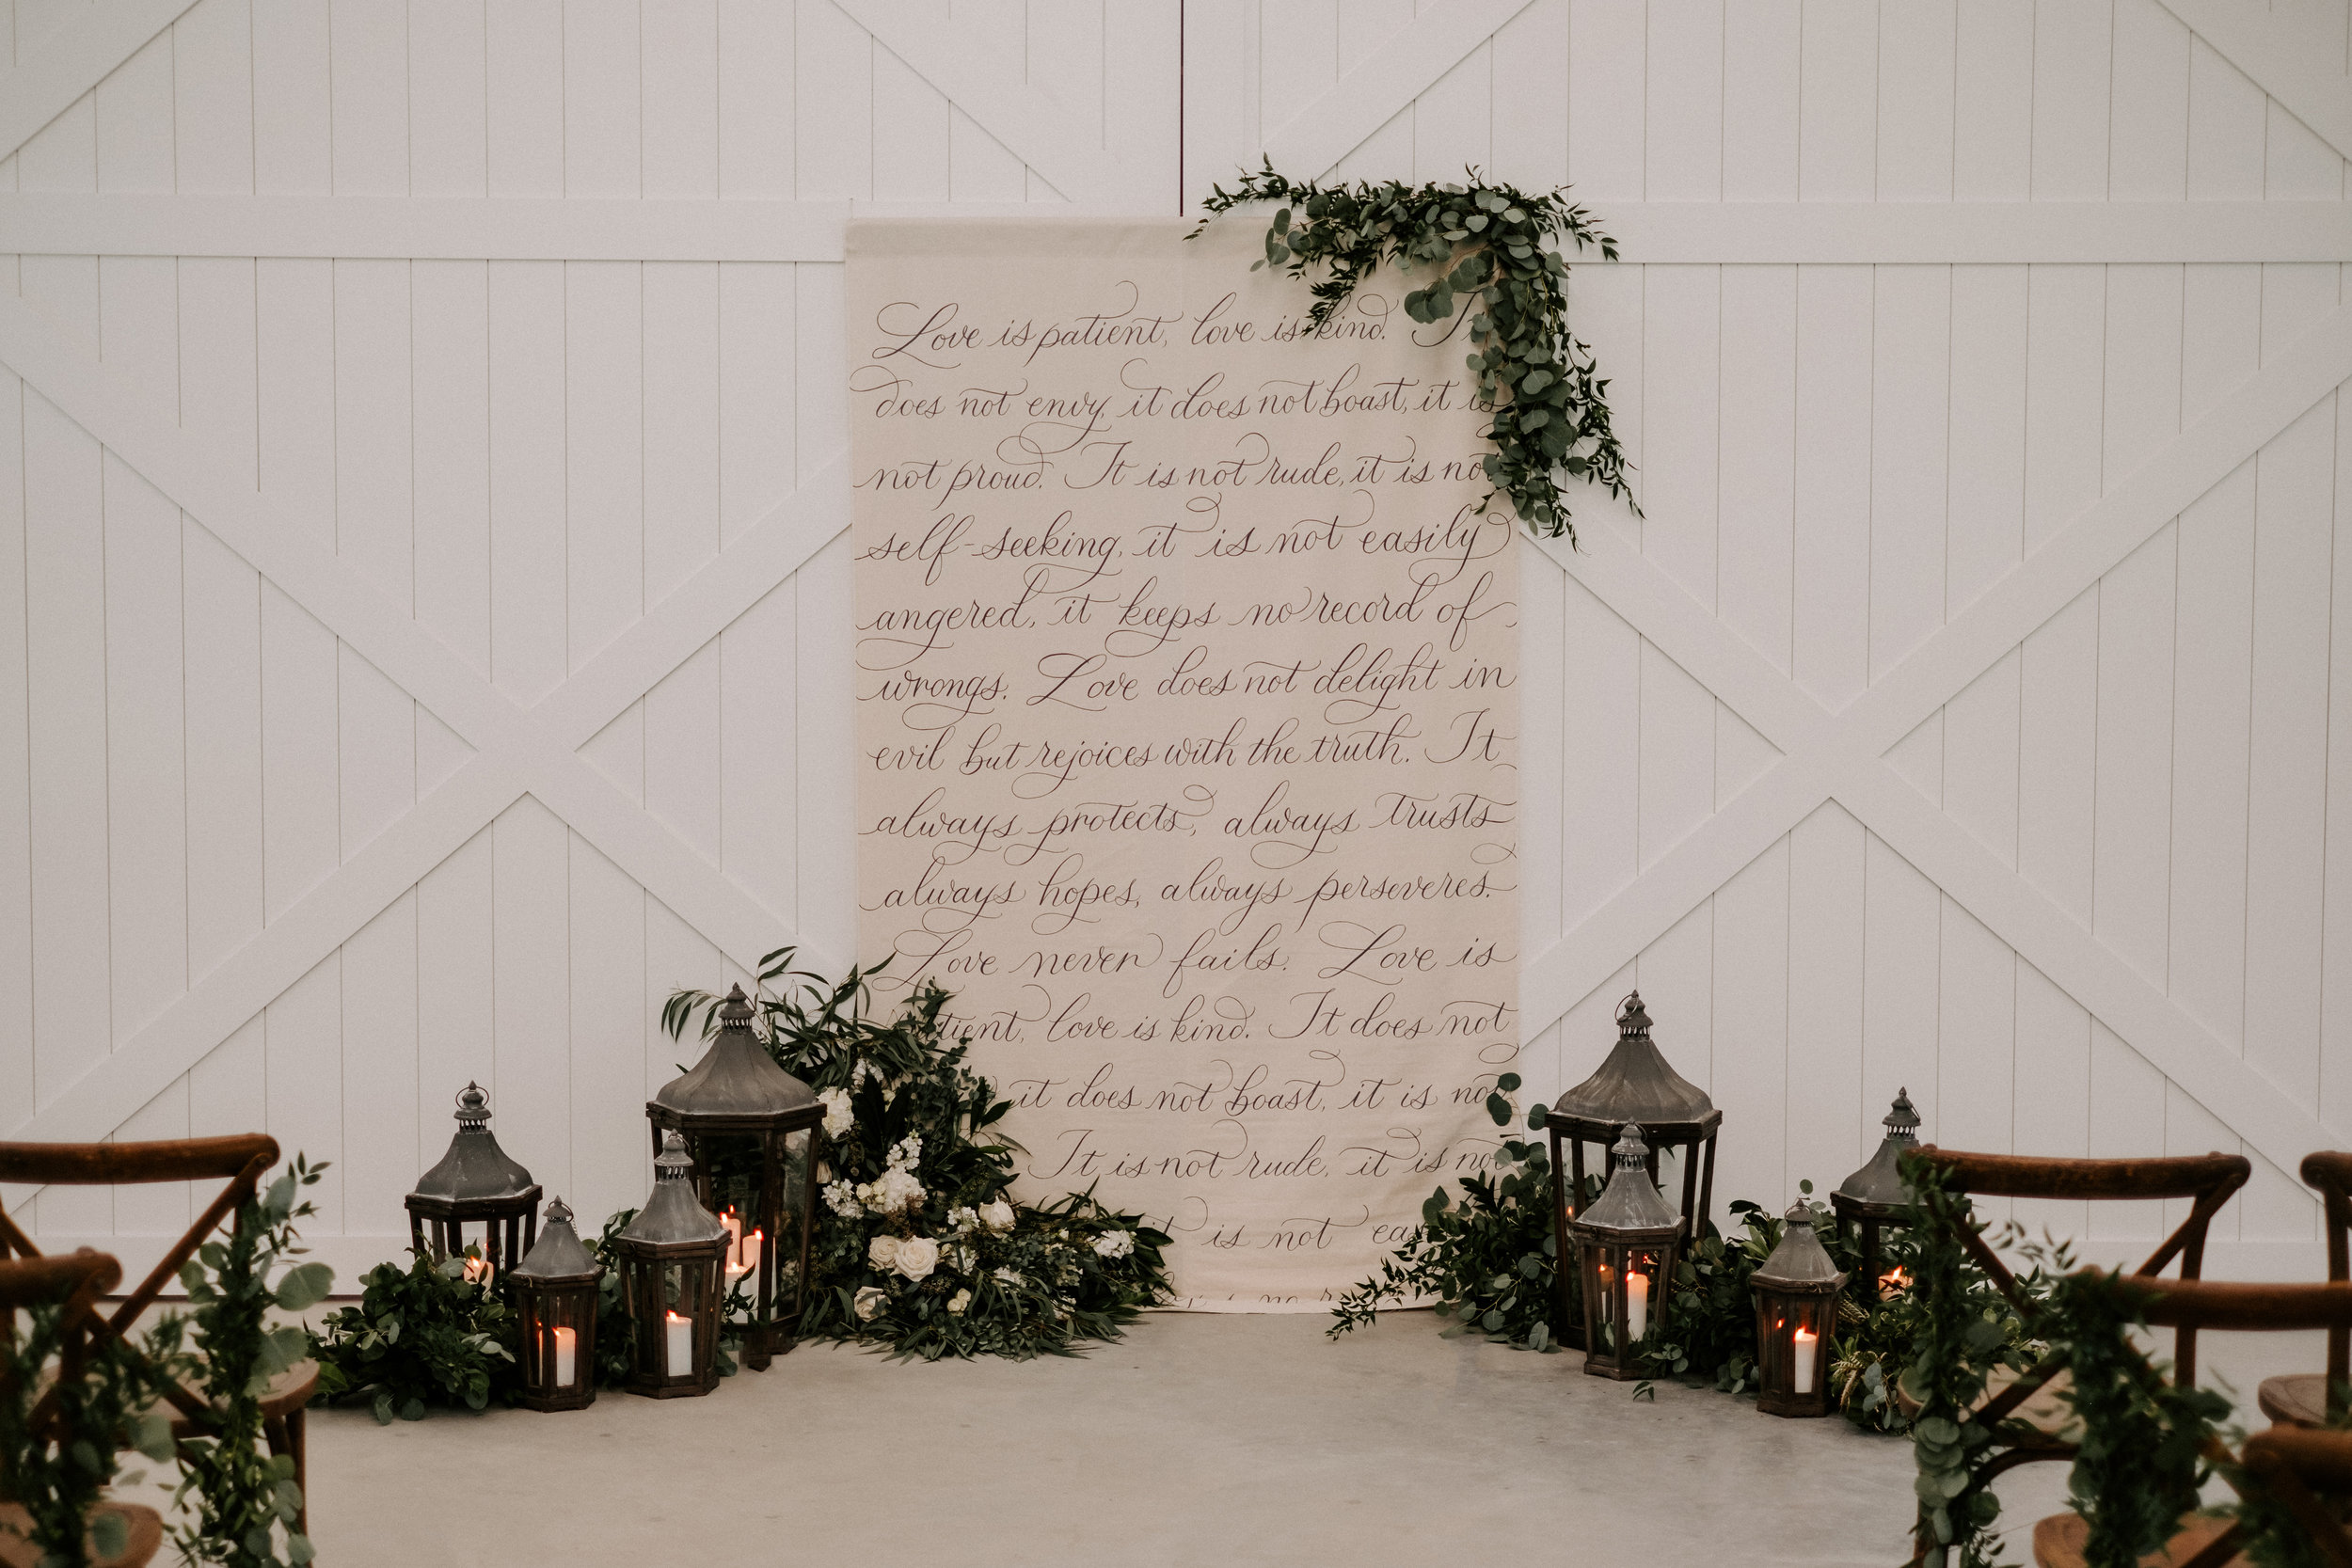 The-Barn-at-Grace-Hill-Wichita-Wedding-Venue-108.jpg